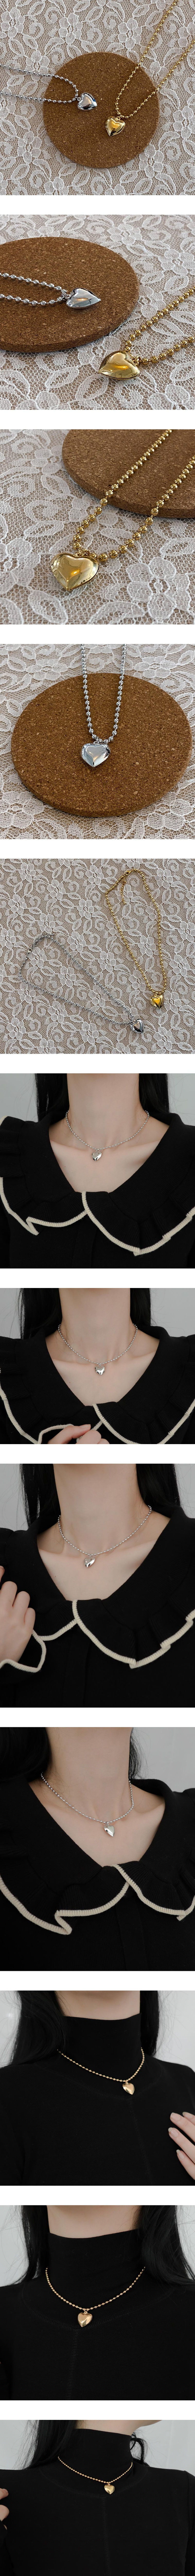 979 Big Bold Heart Ball Necklace